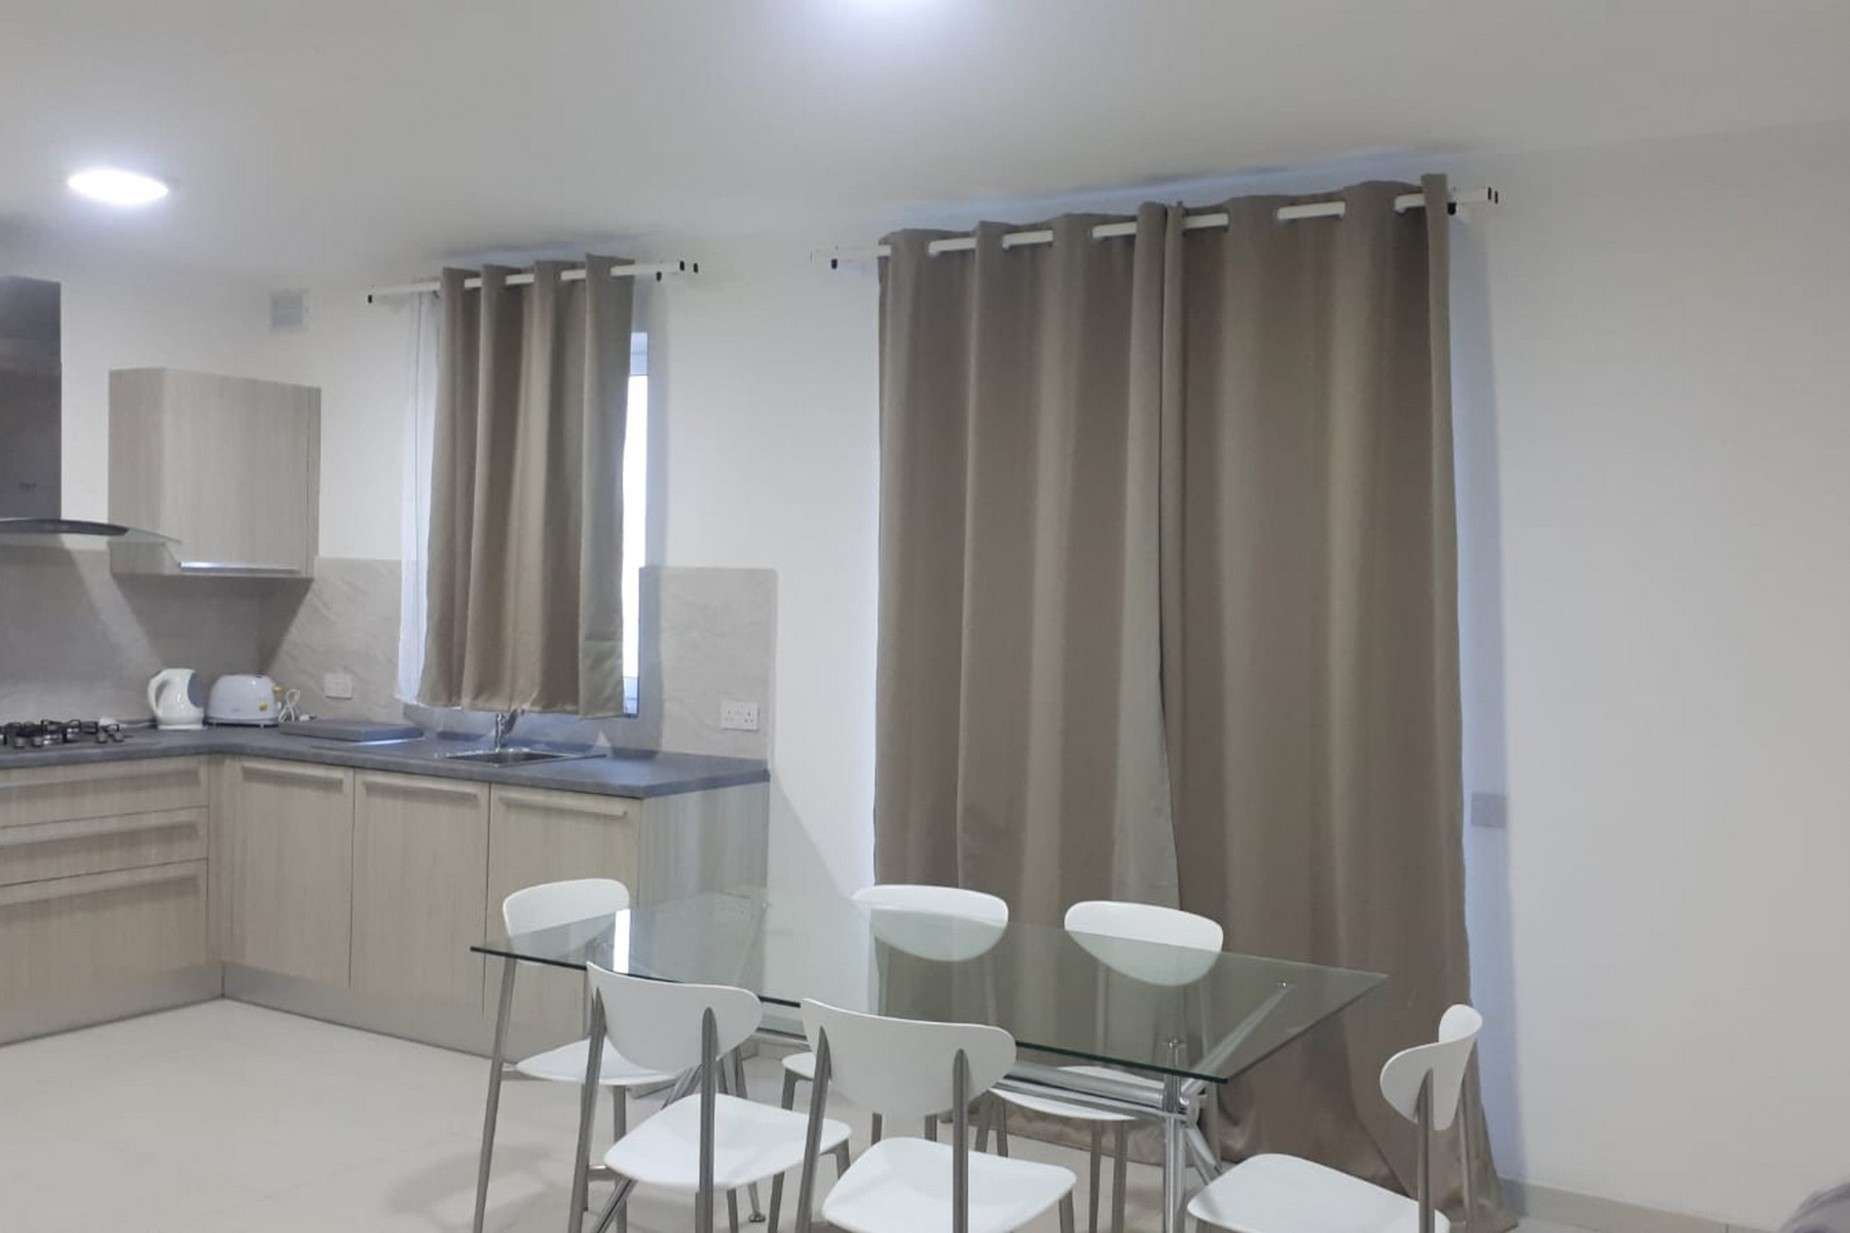 3 bed Apartment For Rent in Rabat, Rabat - thumb 2